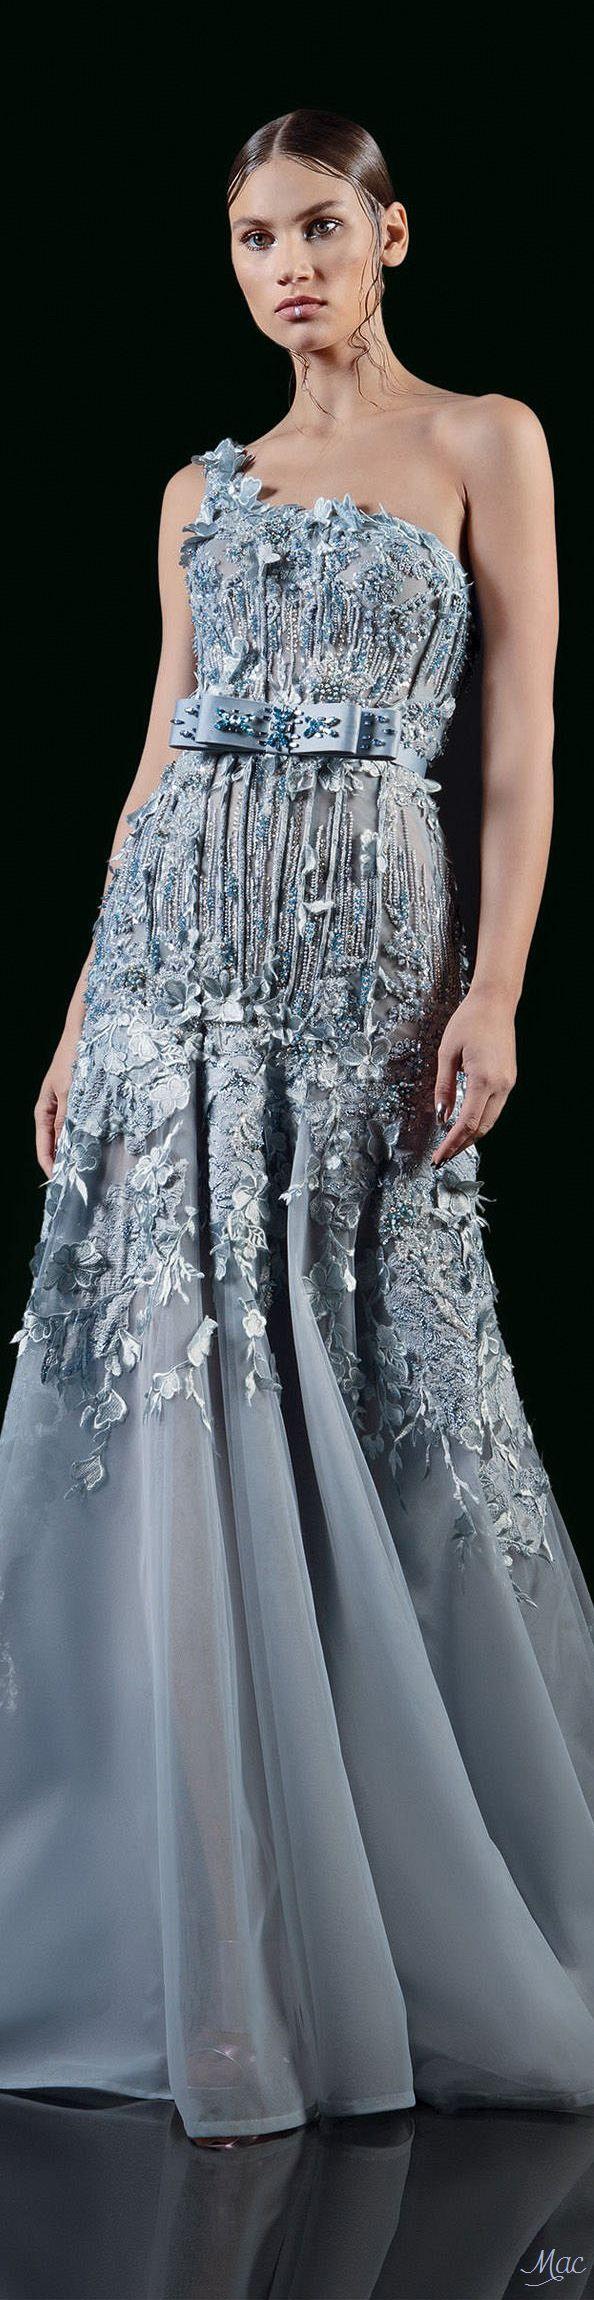 823 best Dress Up images on Pinterest   Crop dress, Dress fashion ...